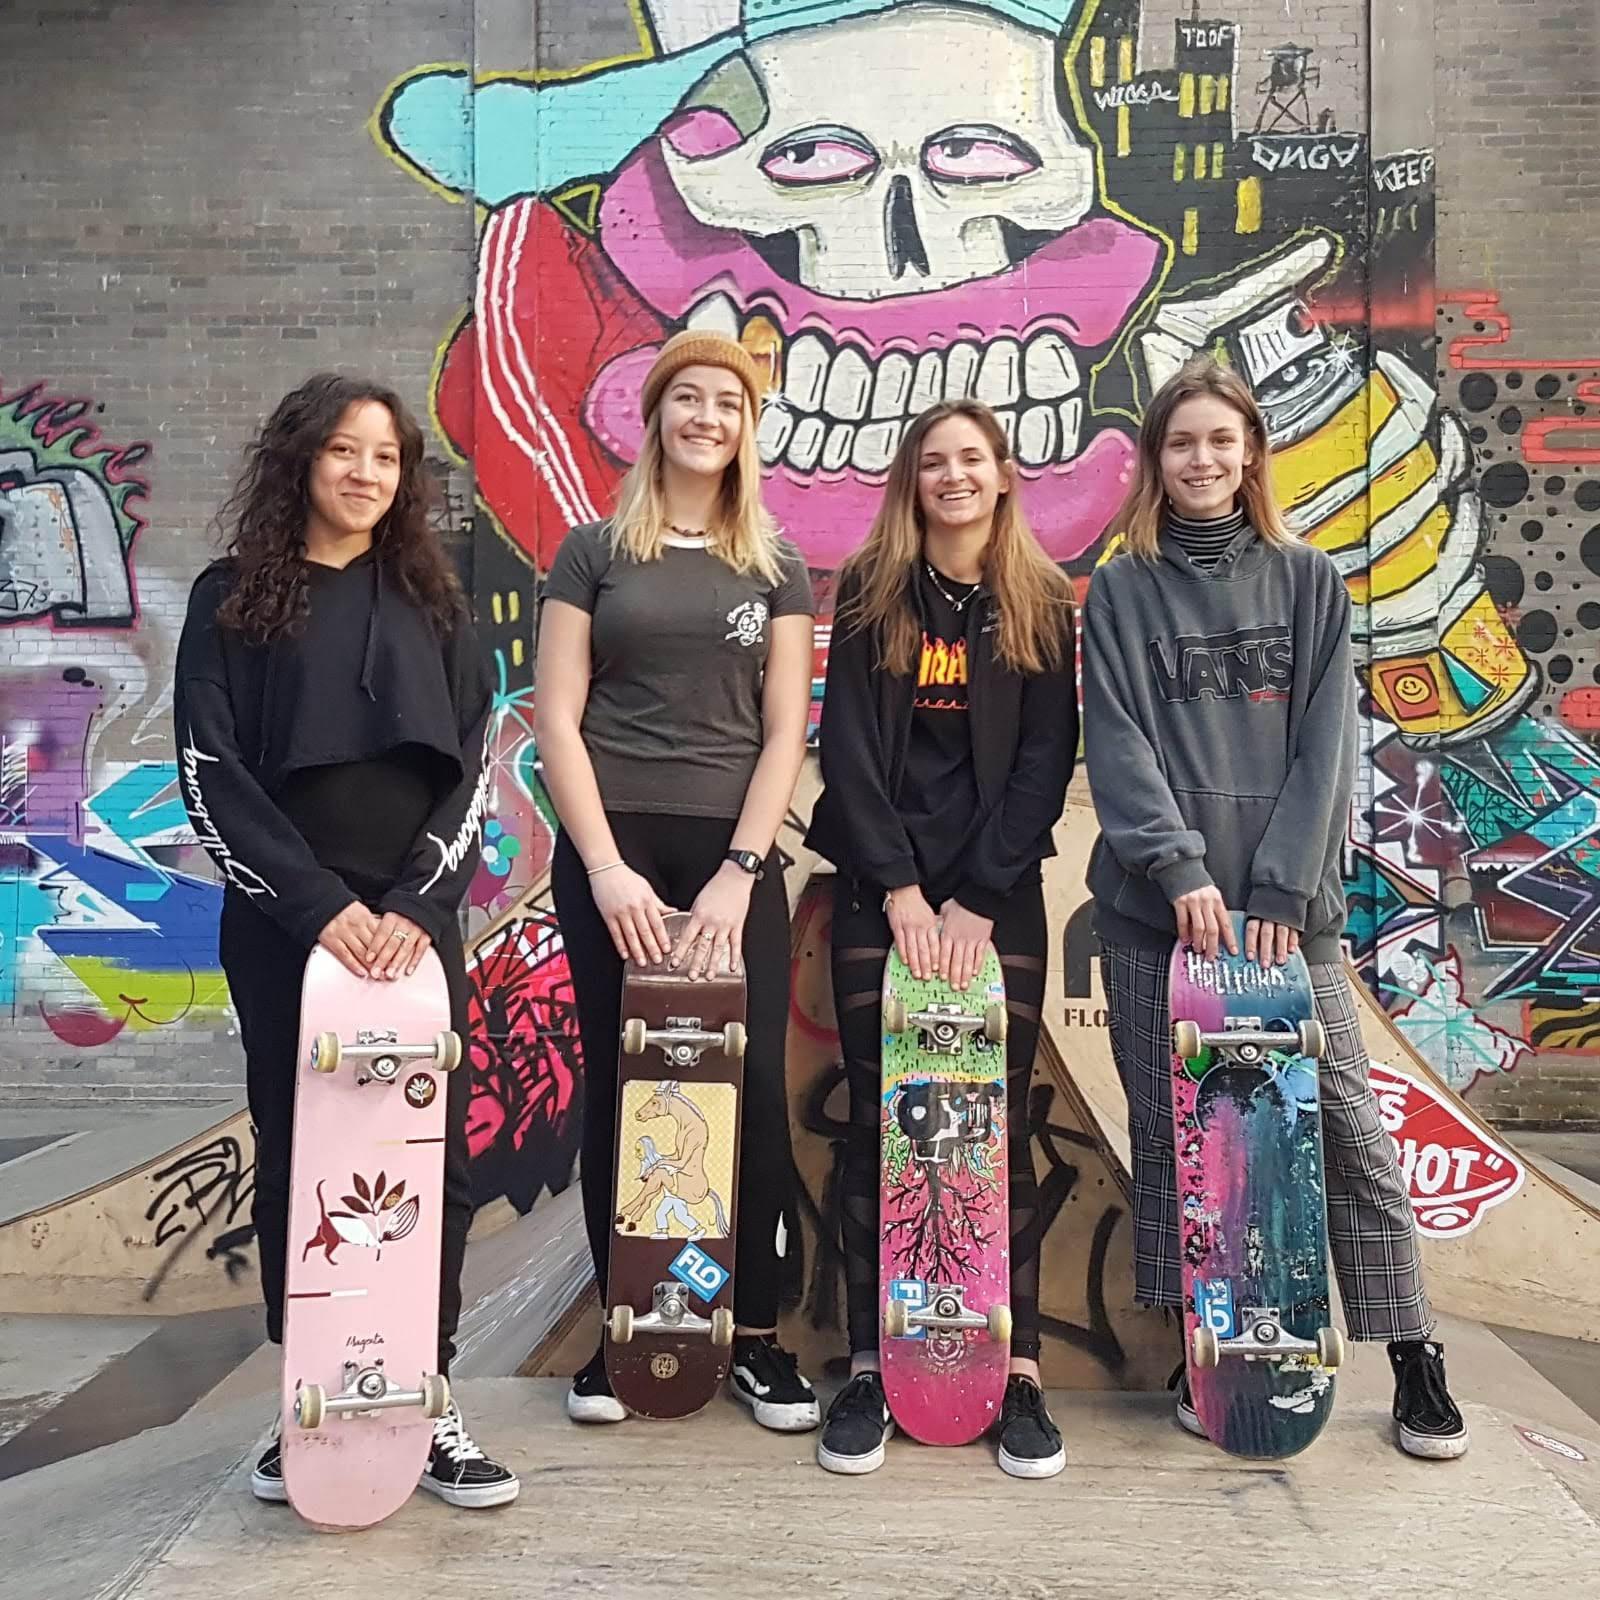 Saturday-Women and Girls Skateboard*